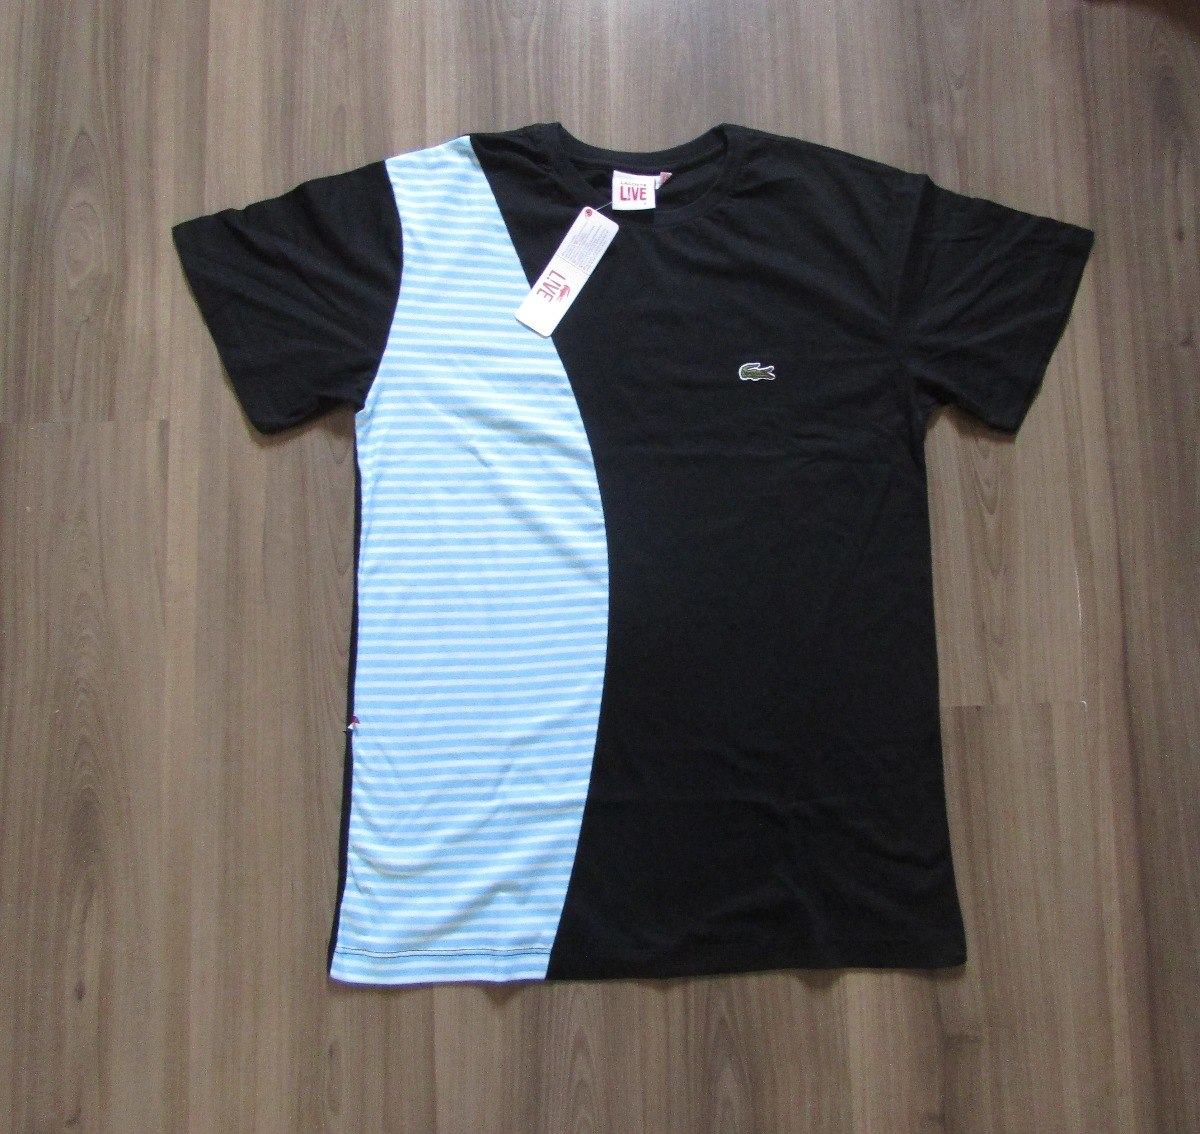 camiseta lacoste live original peruana oferta listrada preta. Carregando  zoom. bddb52a78d